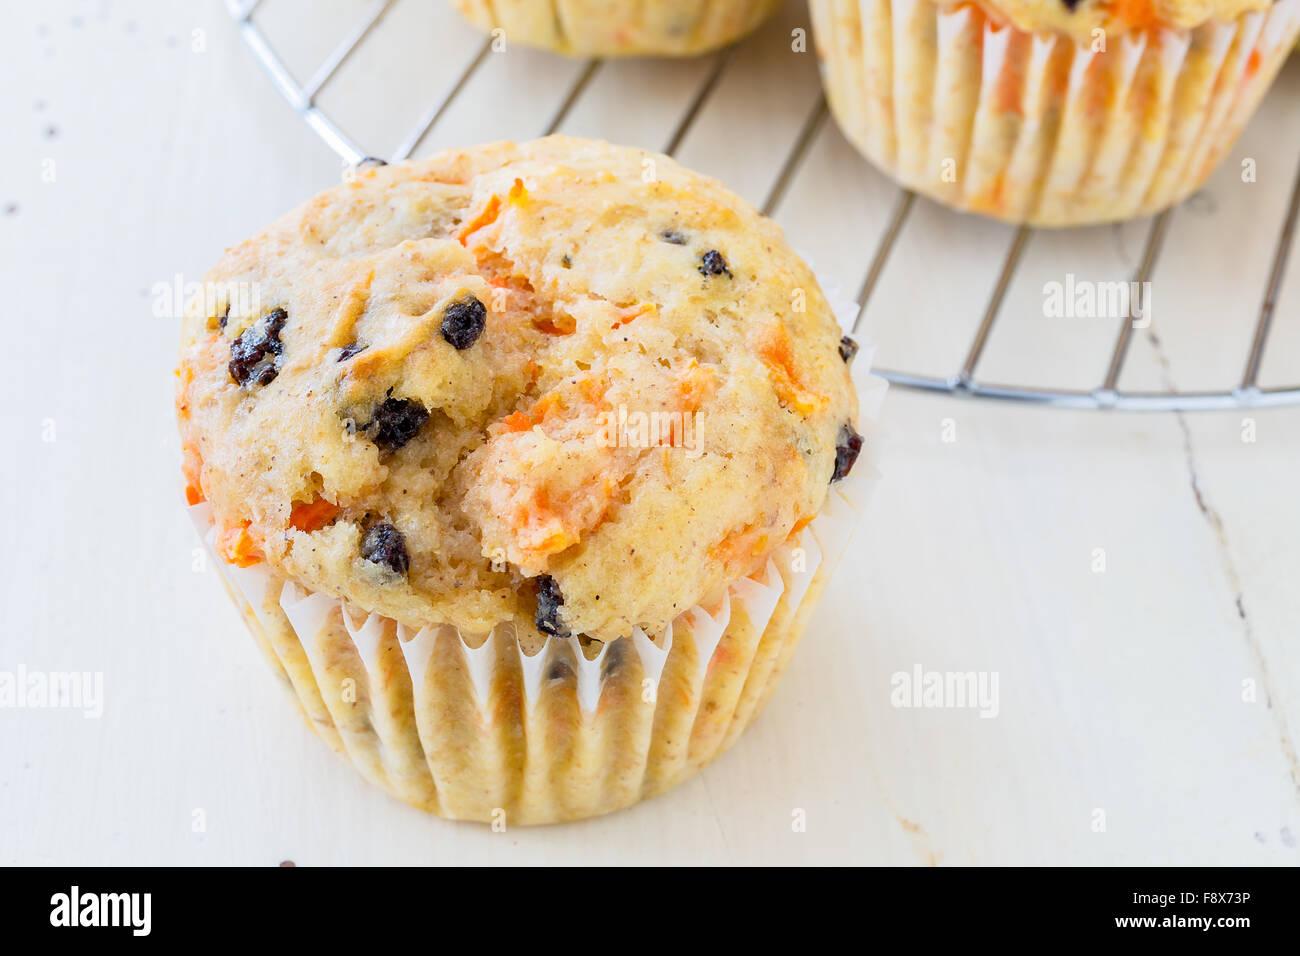 Tasty homemade carrot raisin muffins. - Stock Image